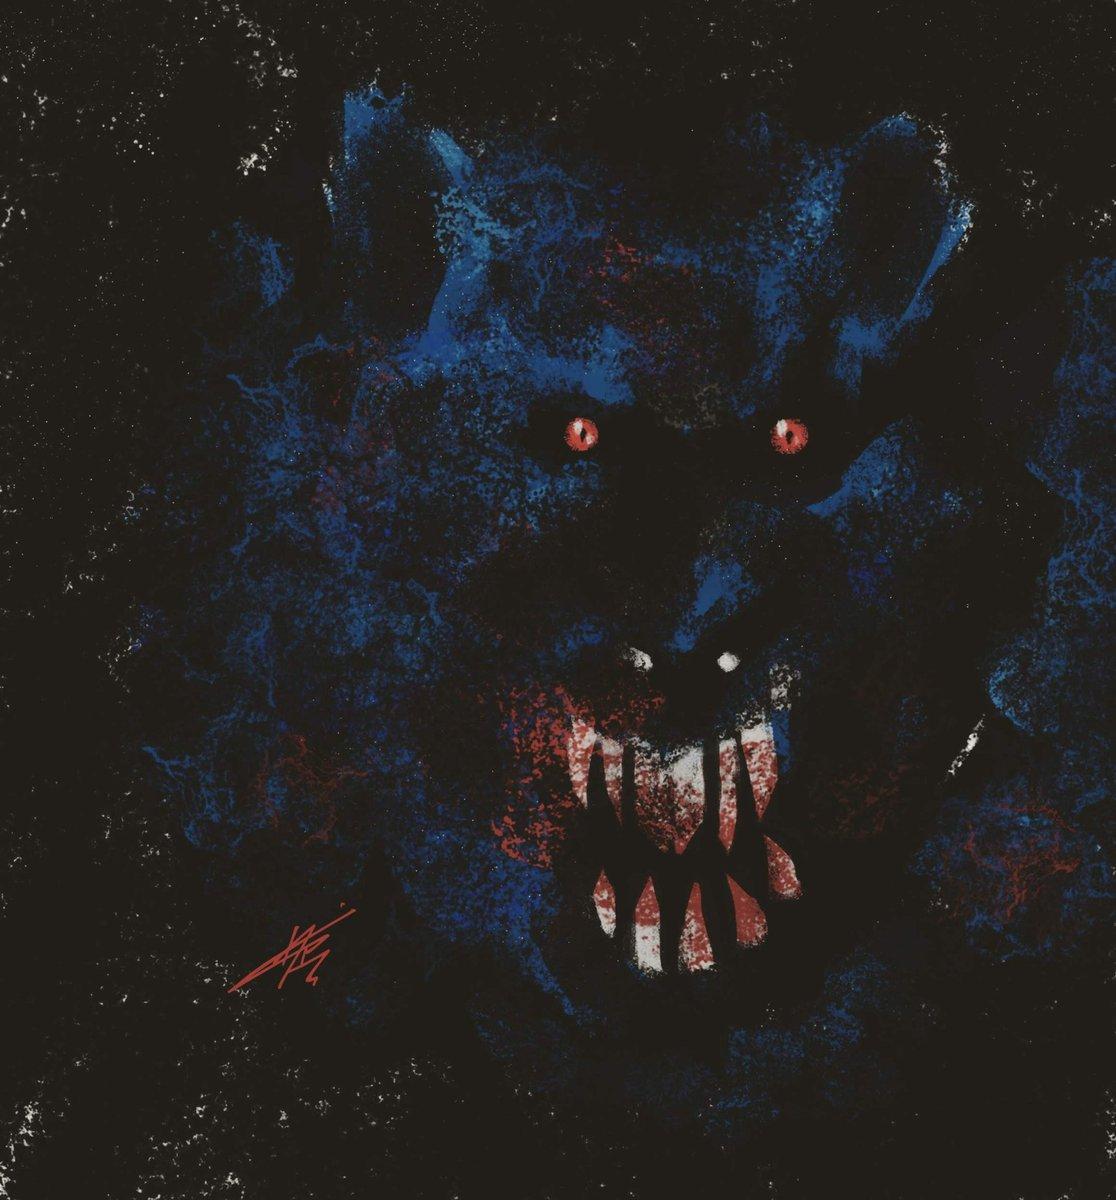 #Werewolf #horror #HorrorMovies #darkfantasy #digitalpainting #artepic.twitter.com/JYwEr5s2YN